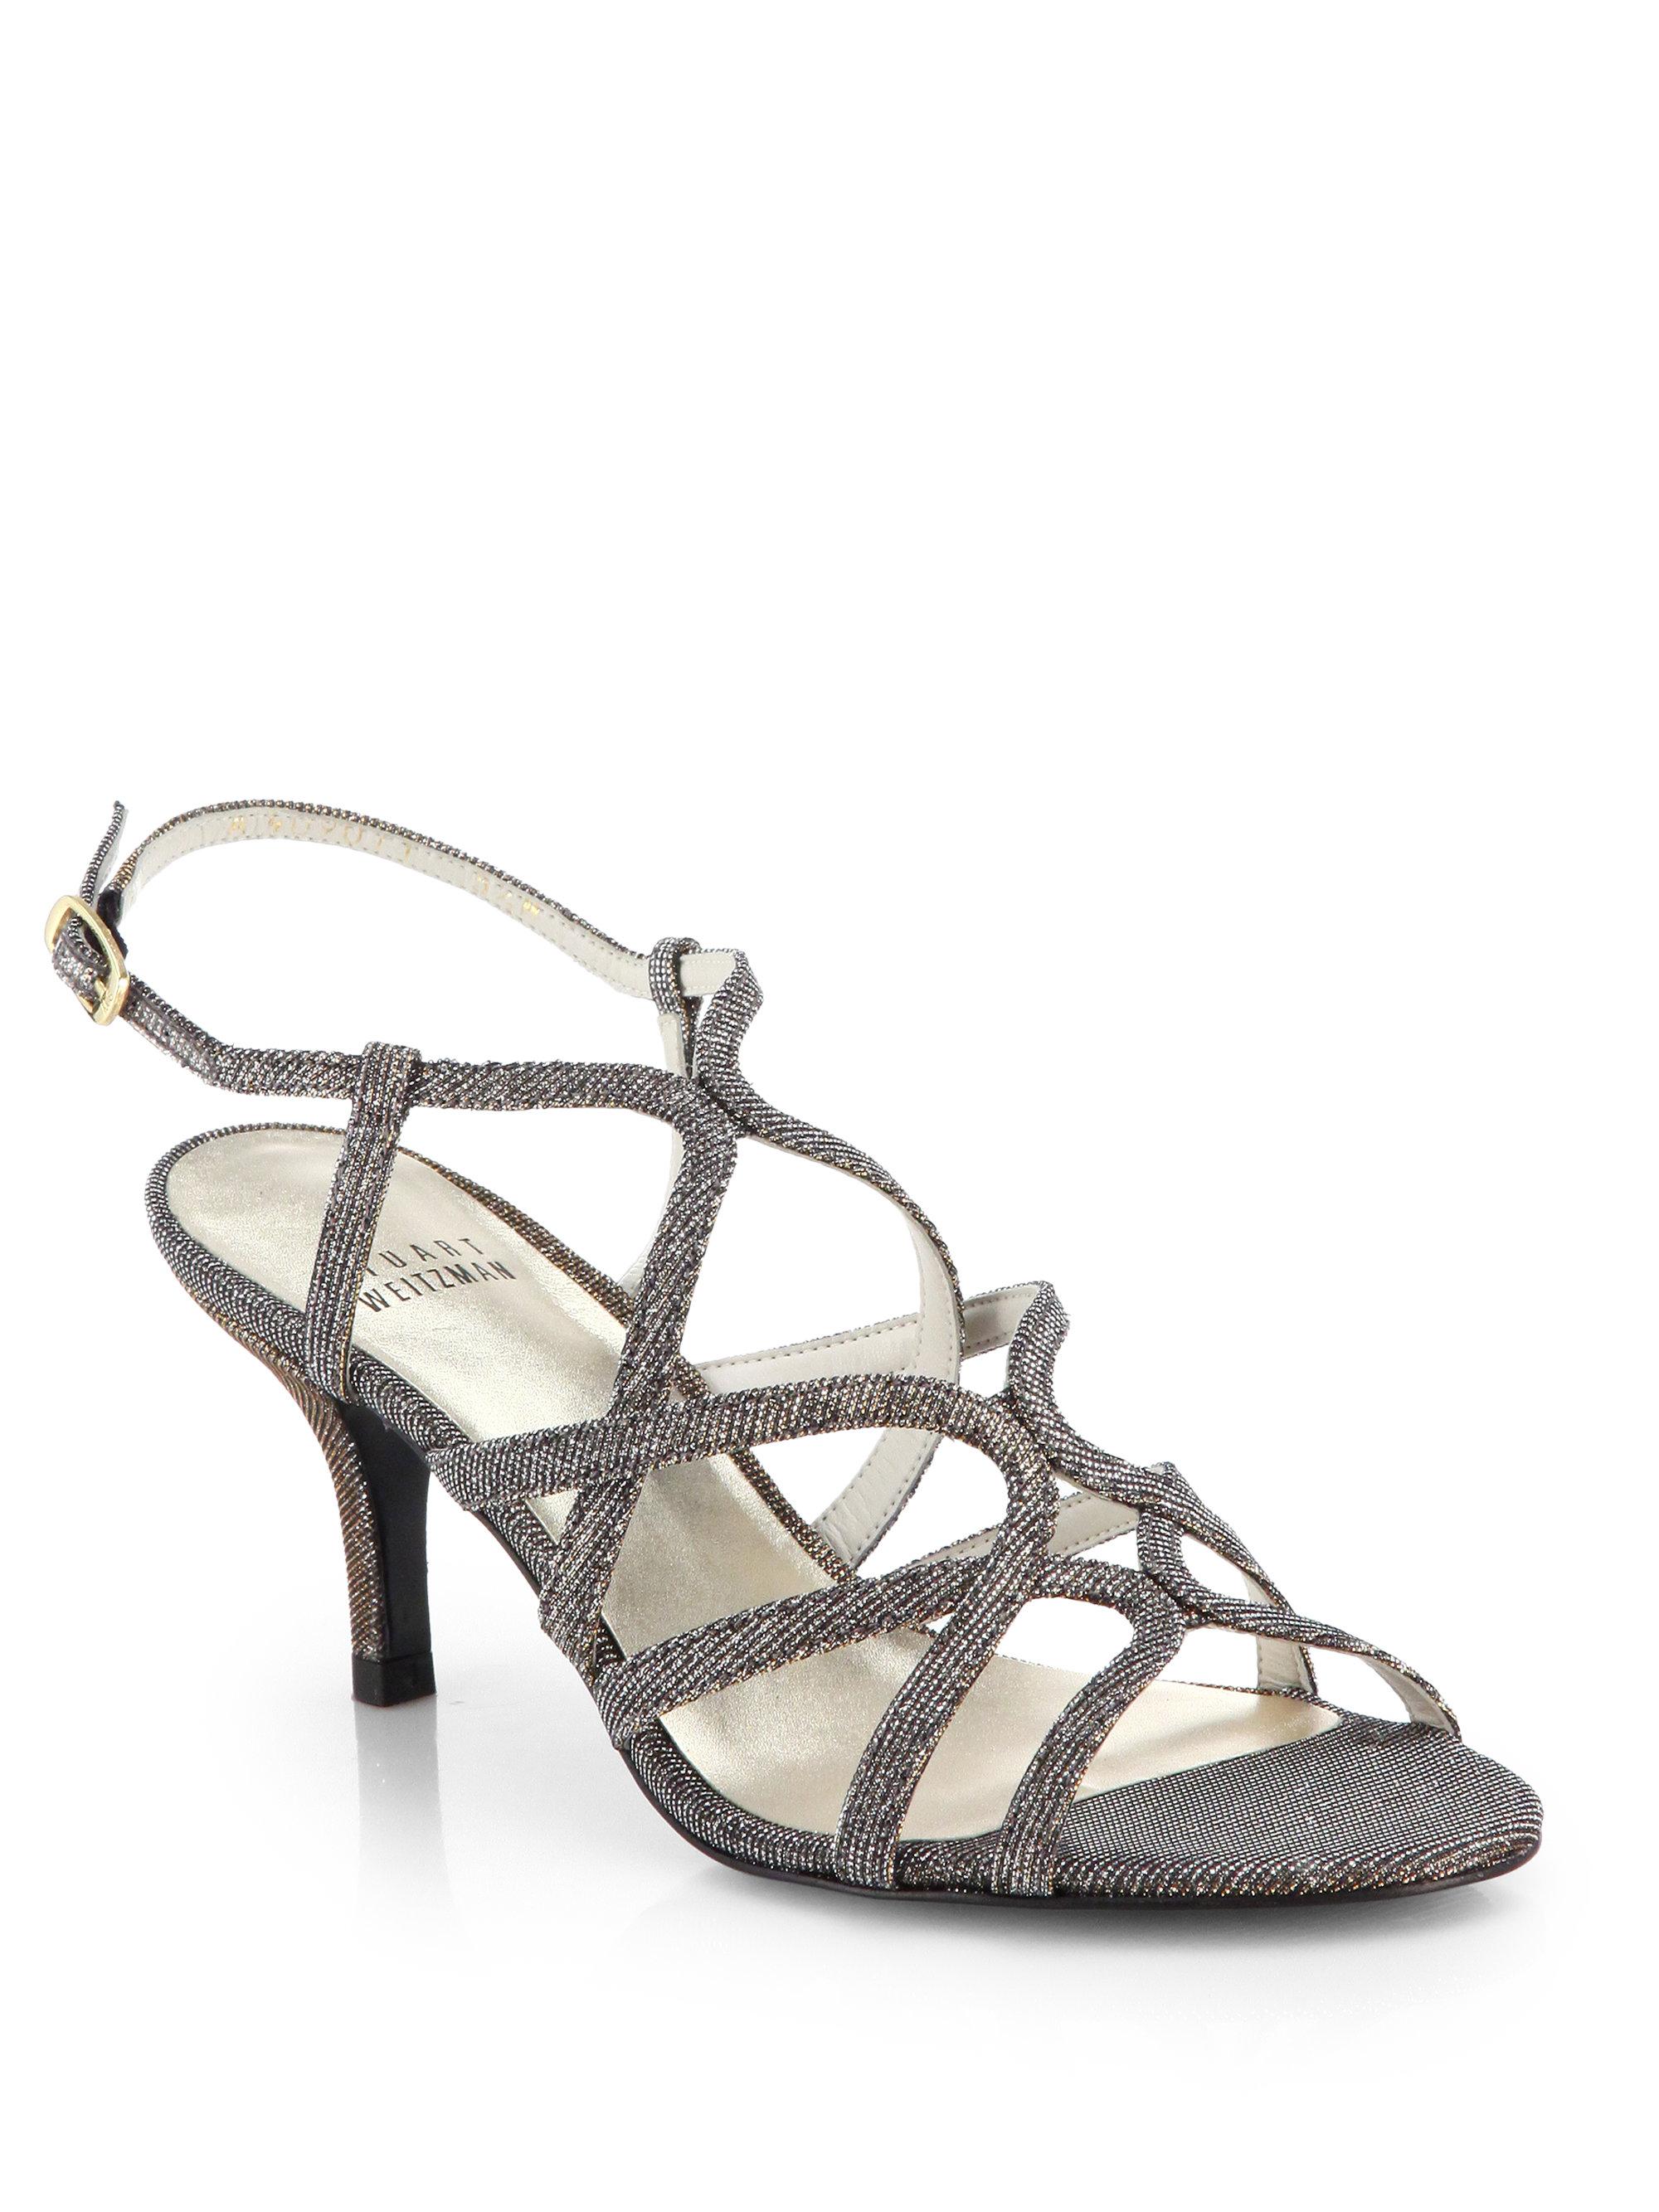 Lyst Stuart Weitzman Turning Up Shimmer Strappy Sandals